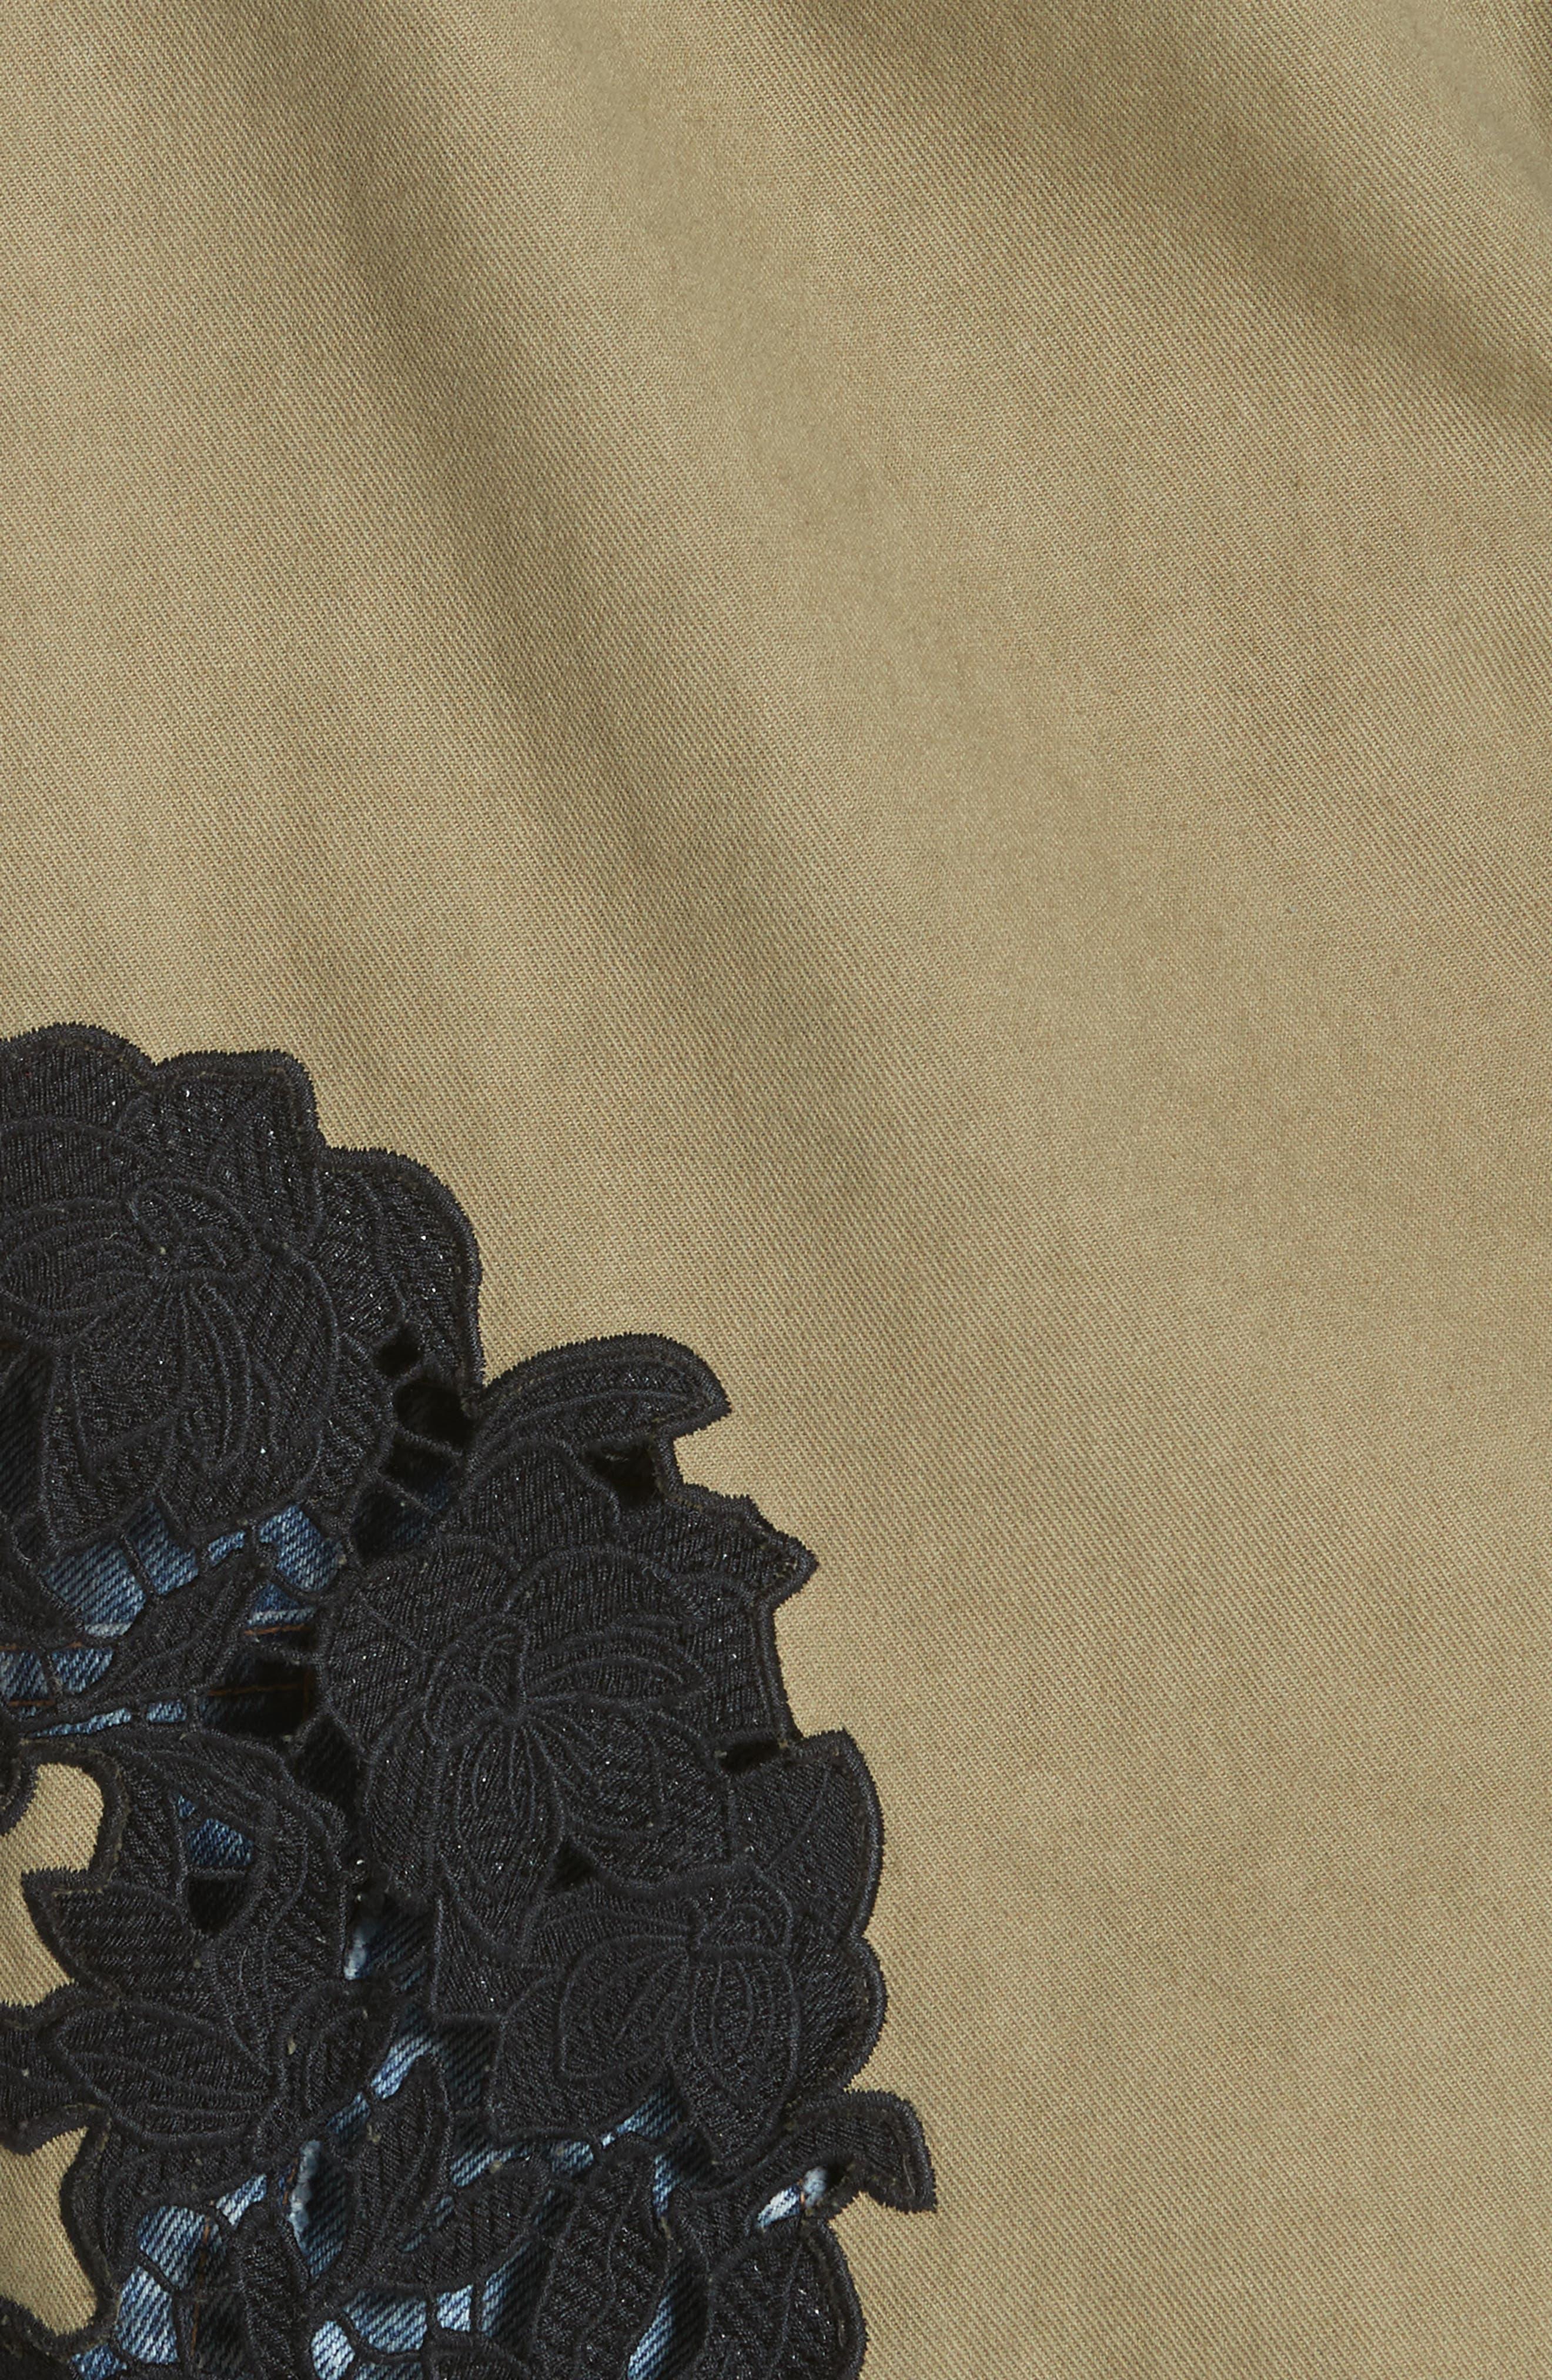 Meta Embroidered Utility Jacket,                             Alternate thumbnail 5, color,                             Olive/ Black